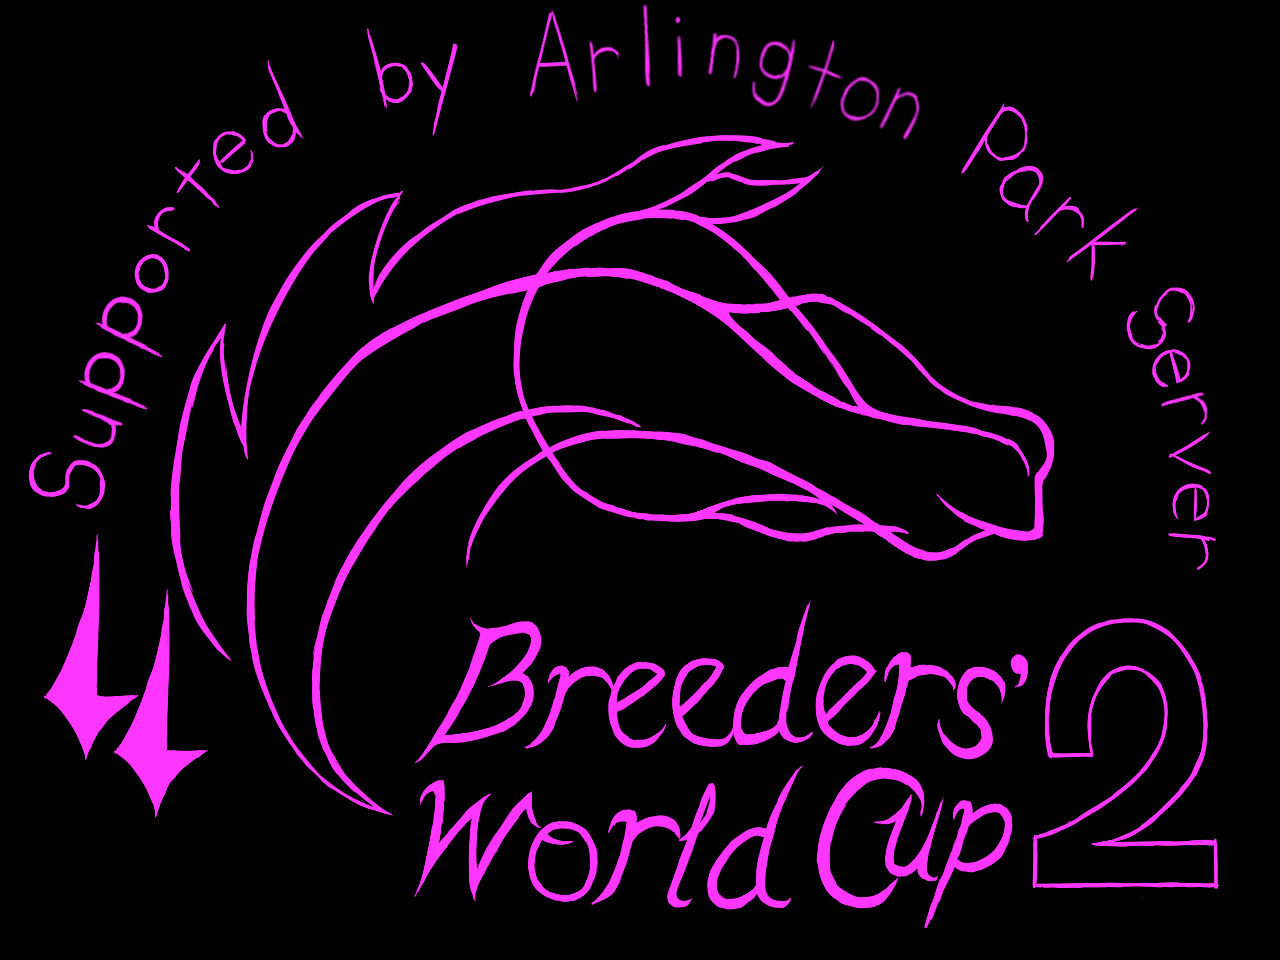 BCワールドカップロゴ